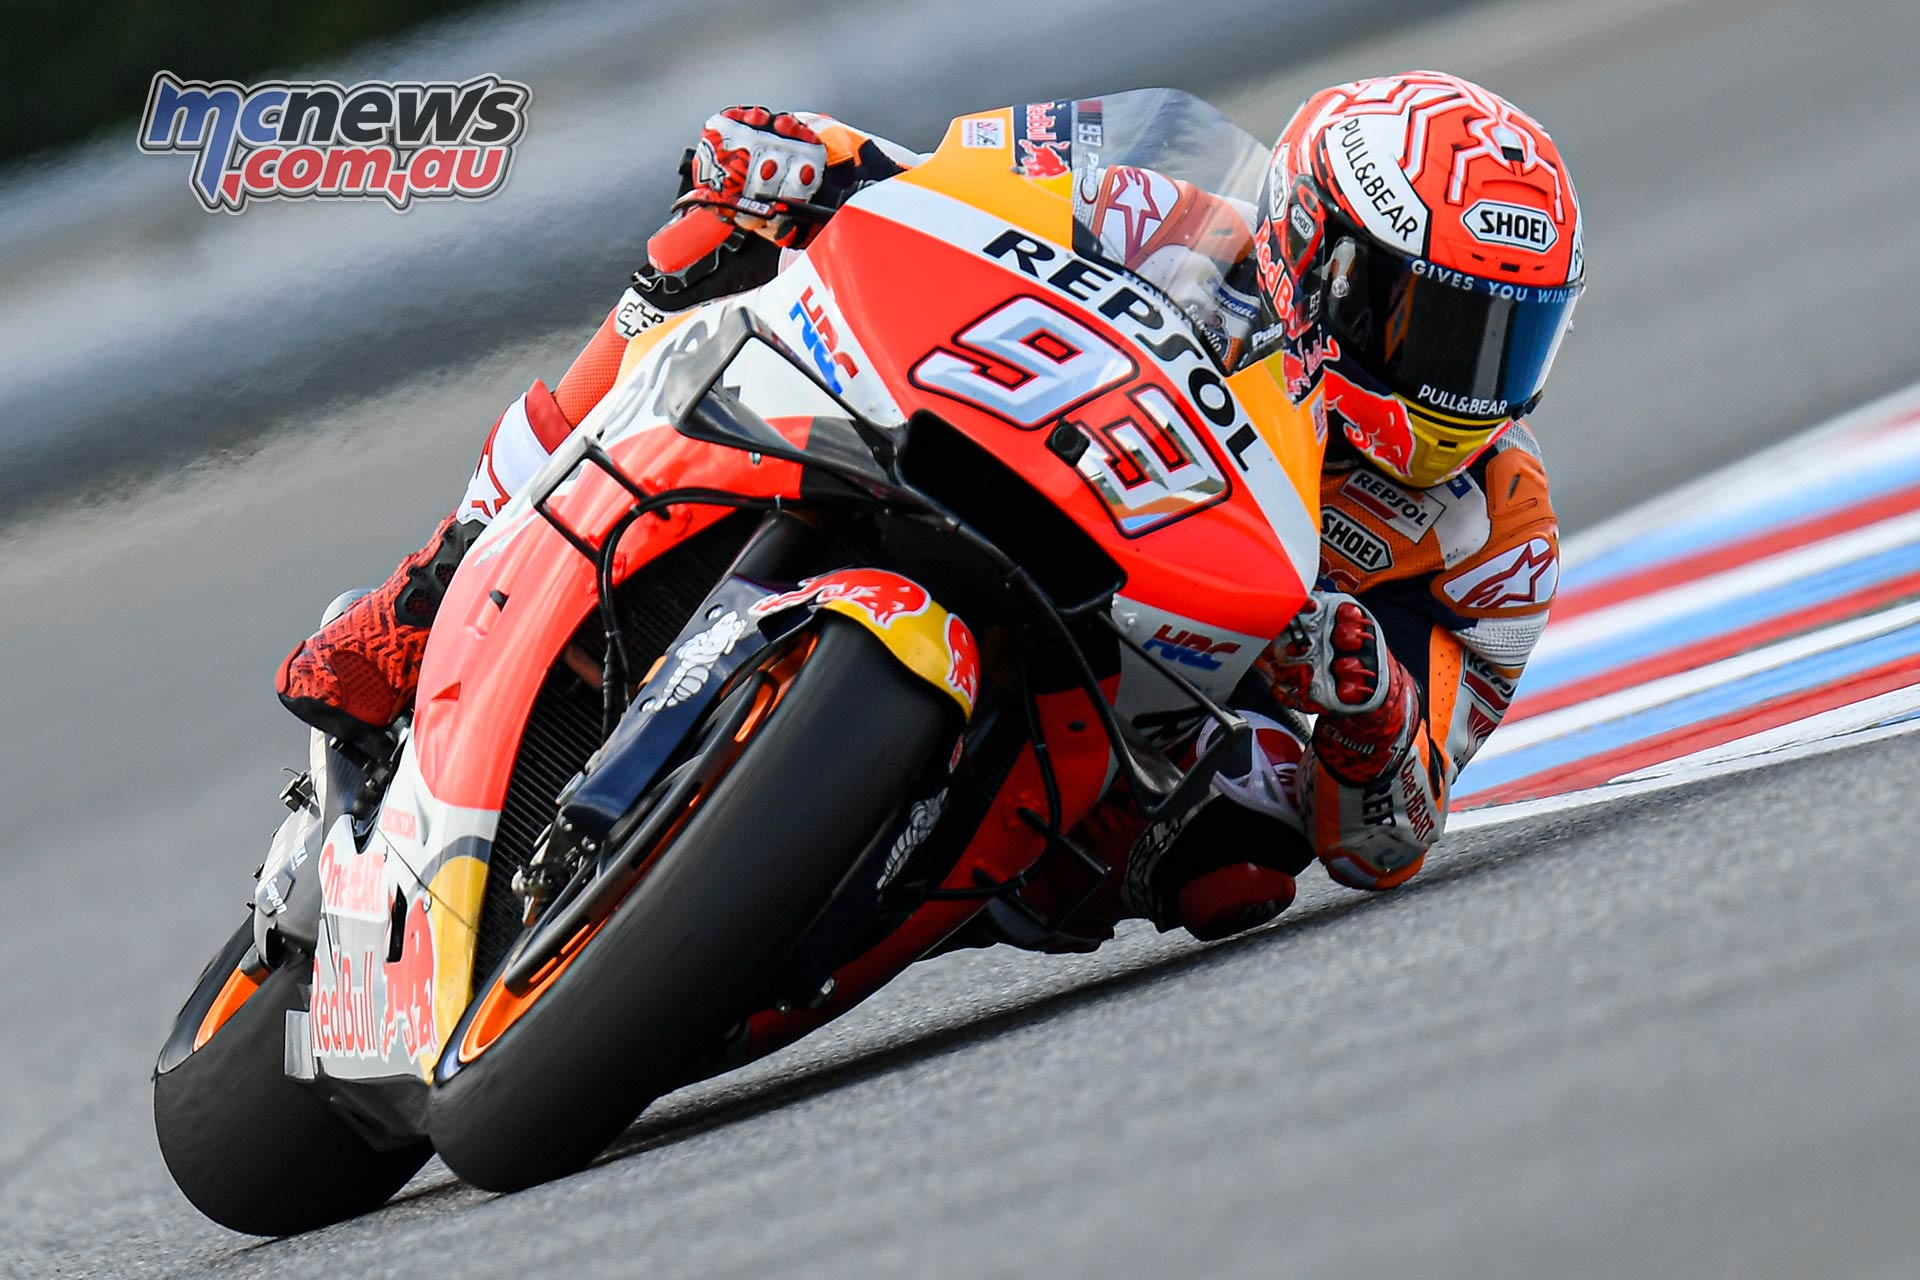 MotoGP Round Brno Fri Marquez Elbow